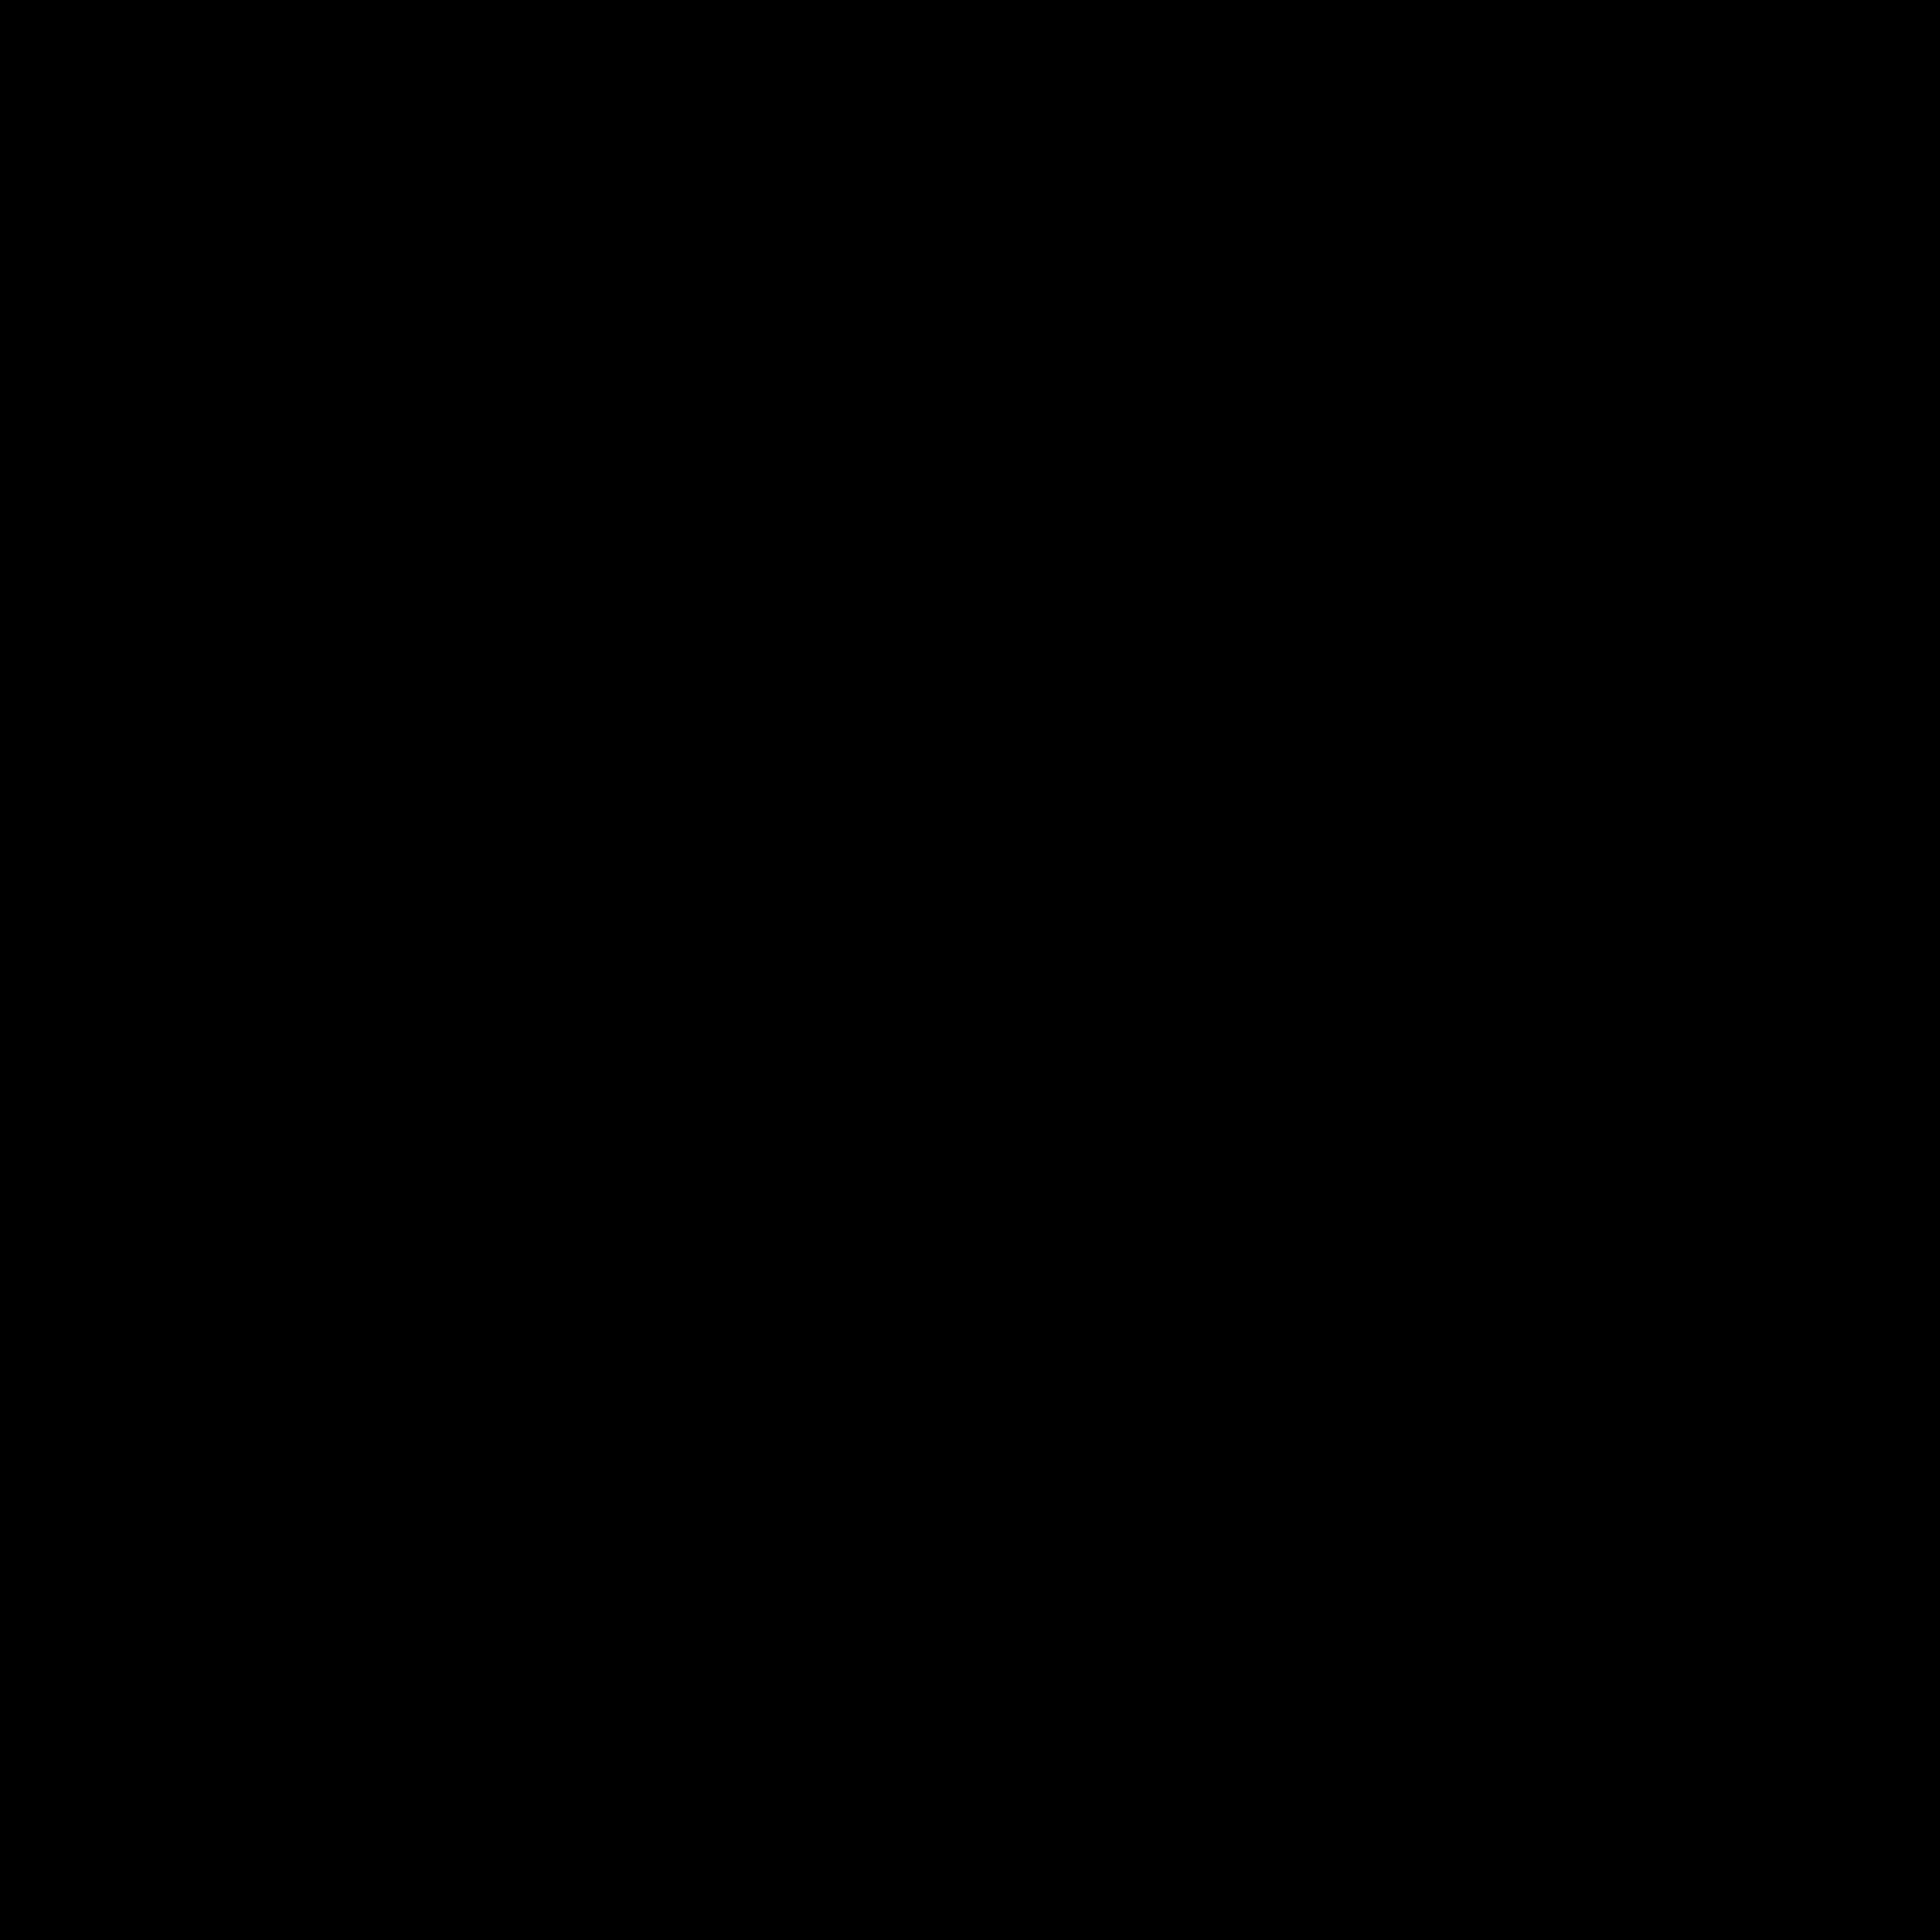 black, goodreads icon